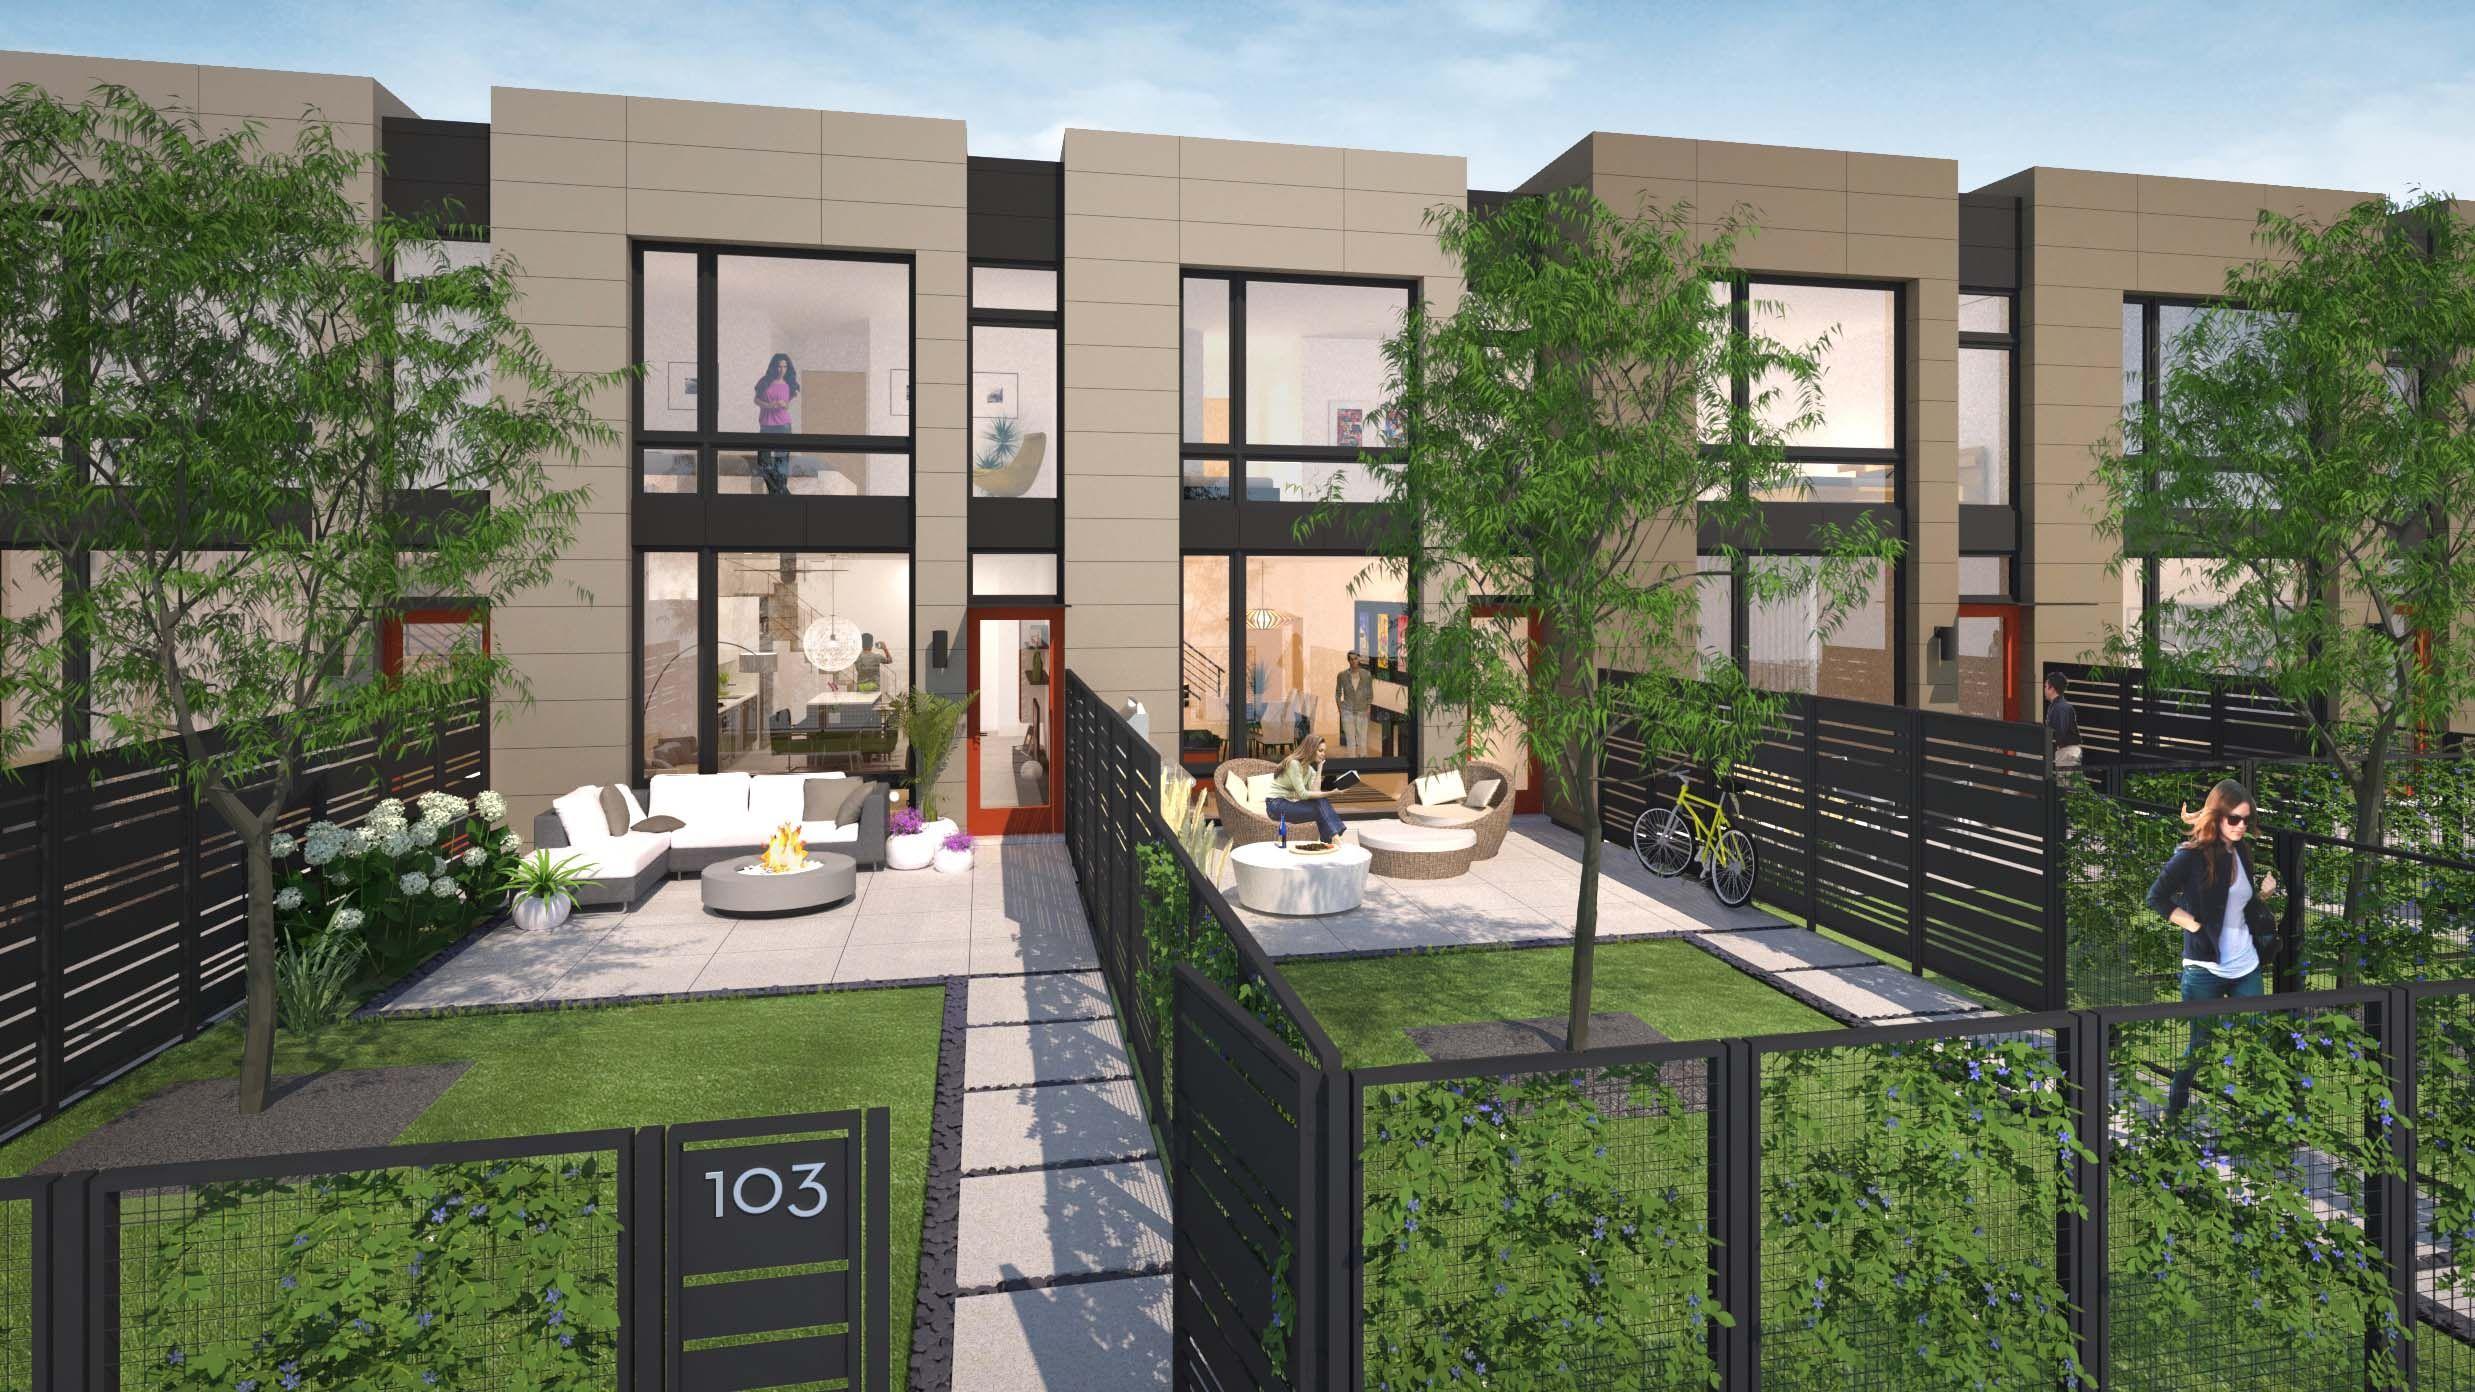 Chicago Development Outdoor gate, Facade house, Townhouse